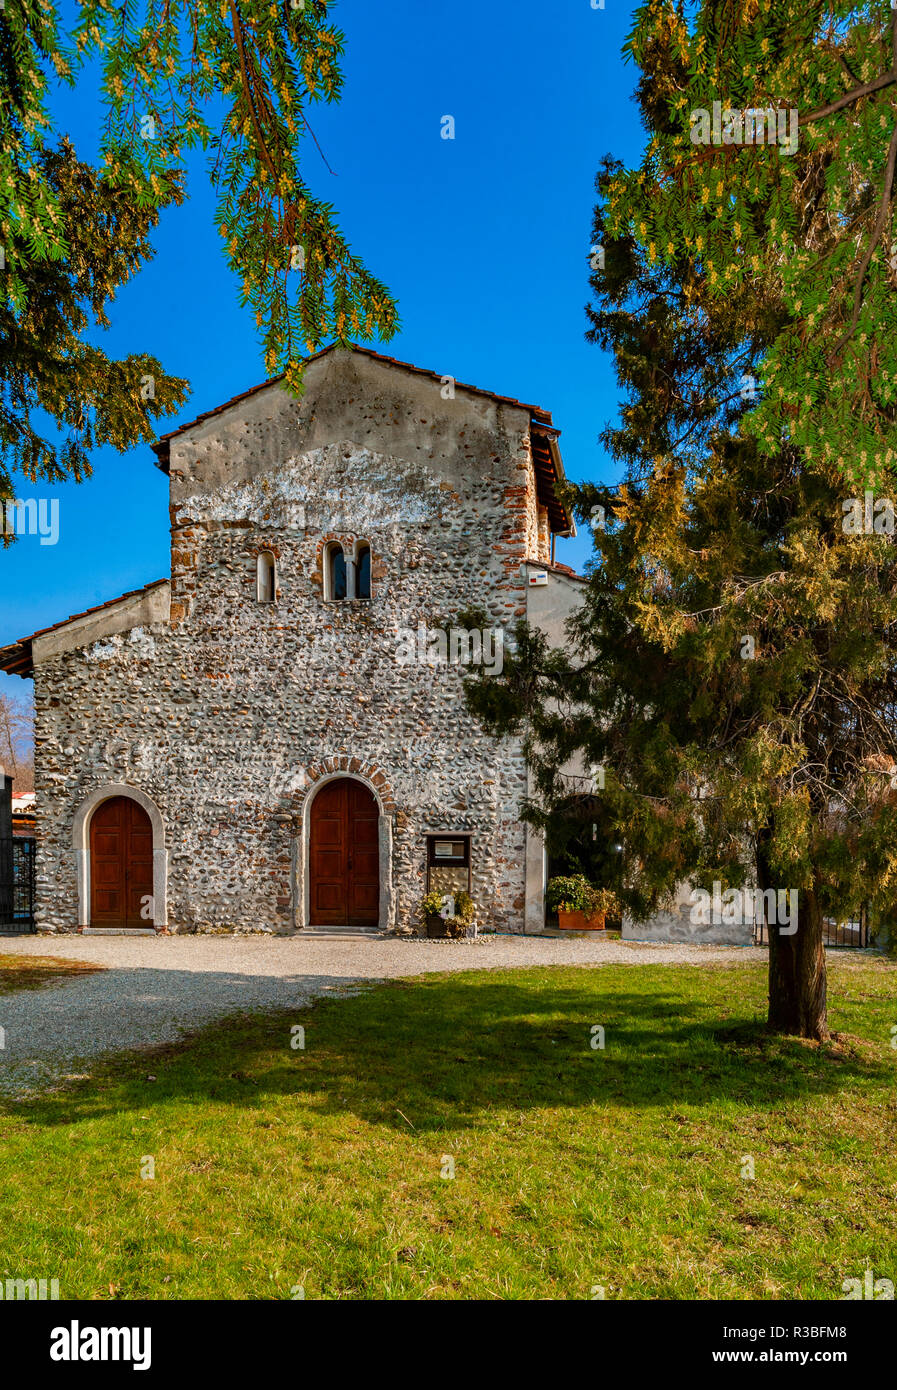 Italia-Piemonte-Valsesia Serravalle Sesia Pieve Santa Maria di Naula - Stock Image